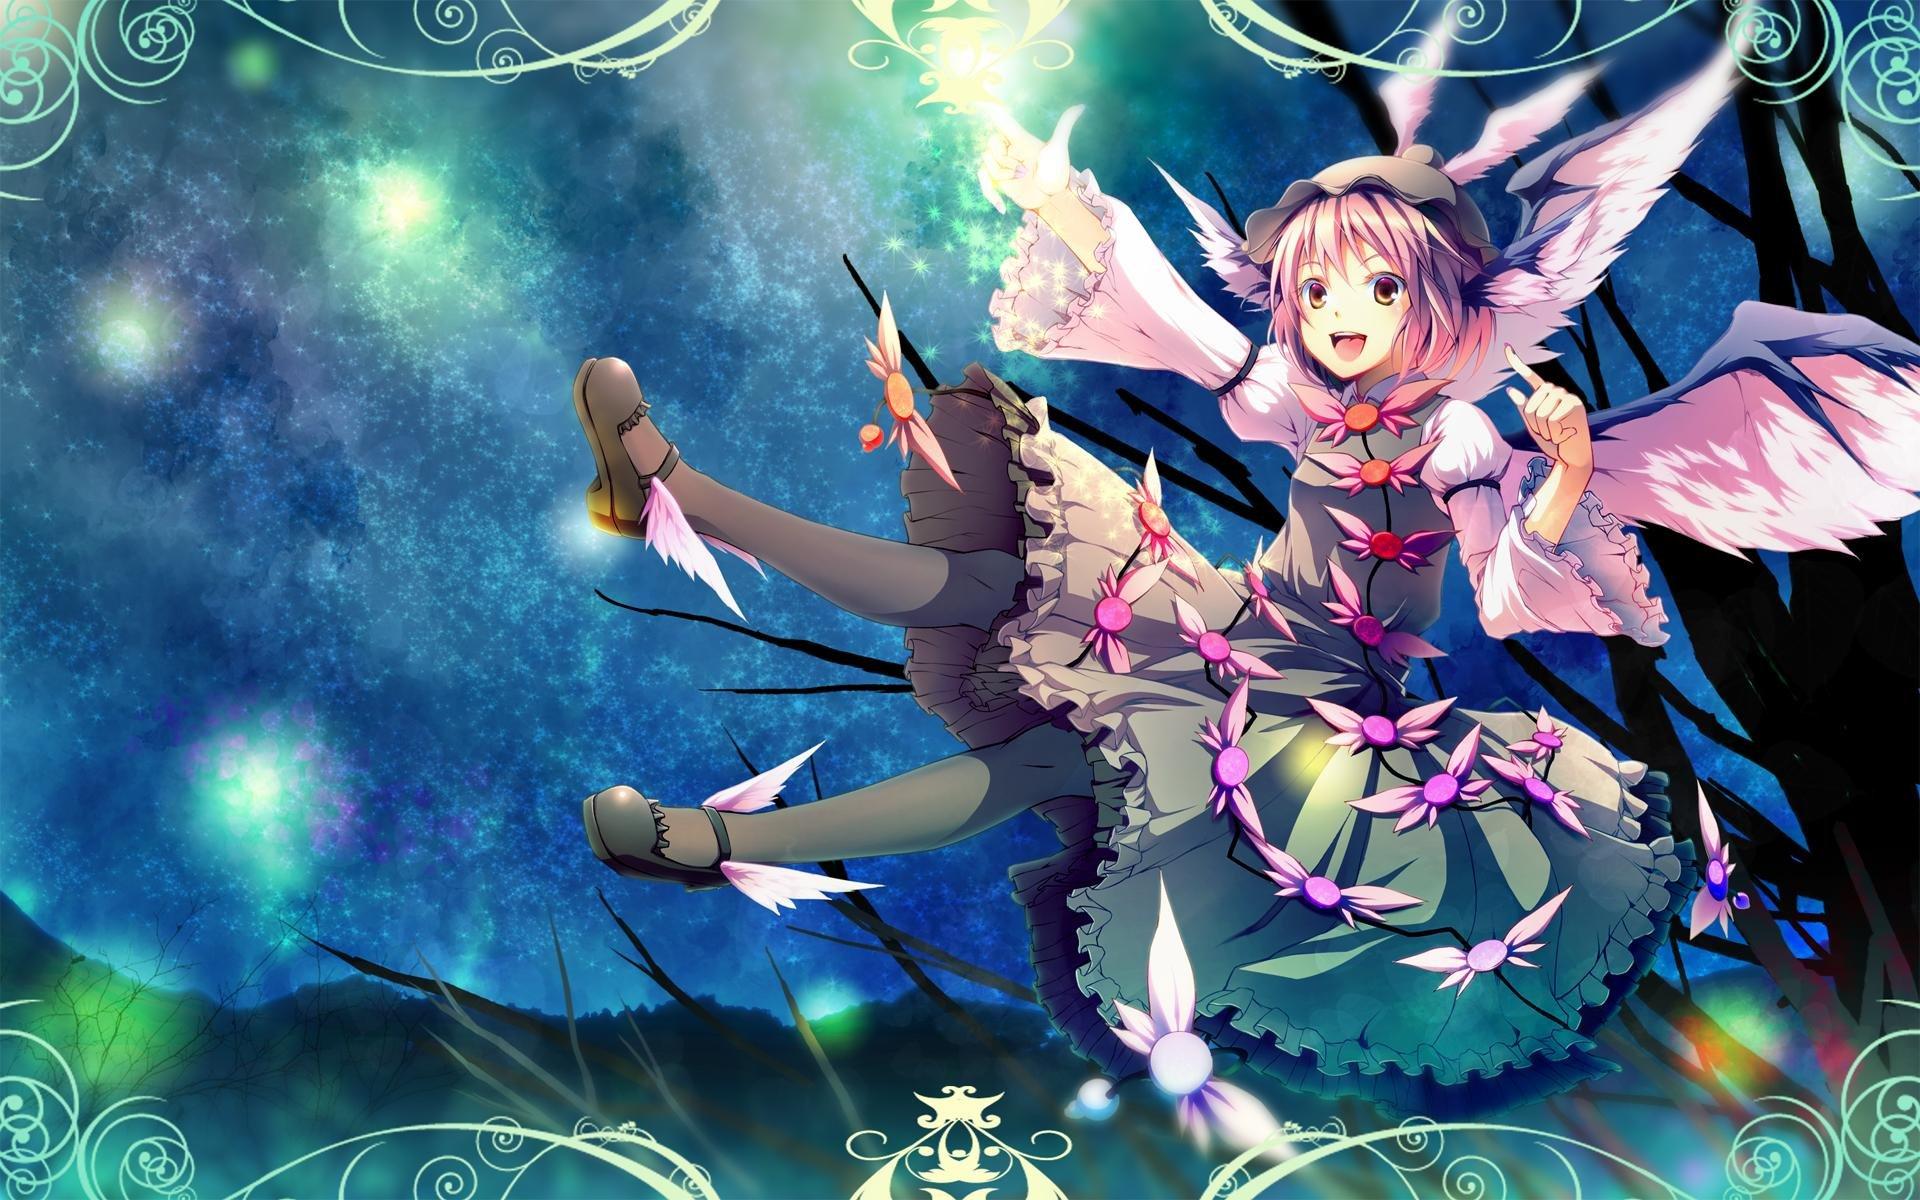 Anime Art Wallpaper (Part 12)